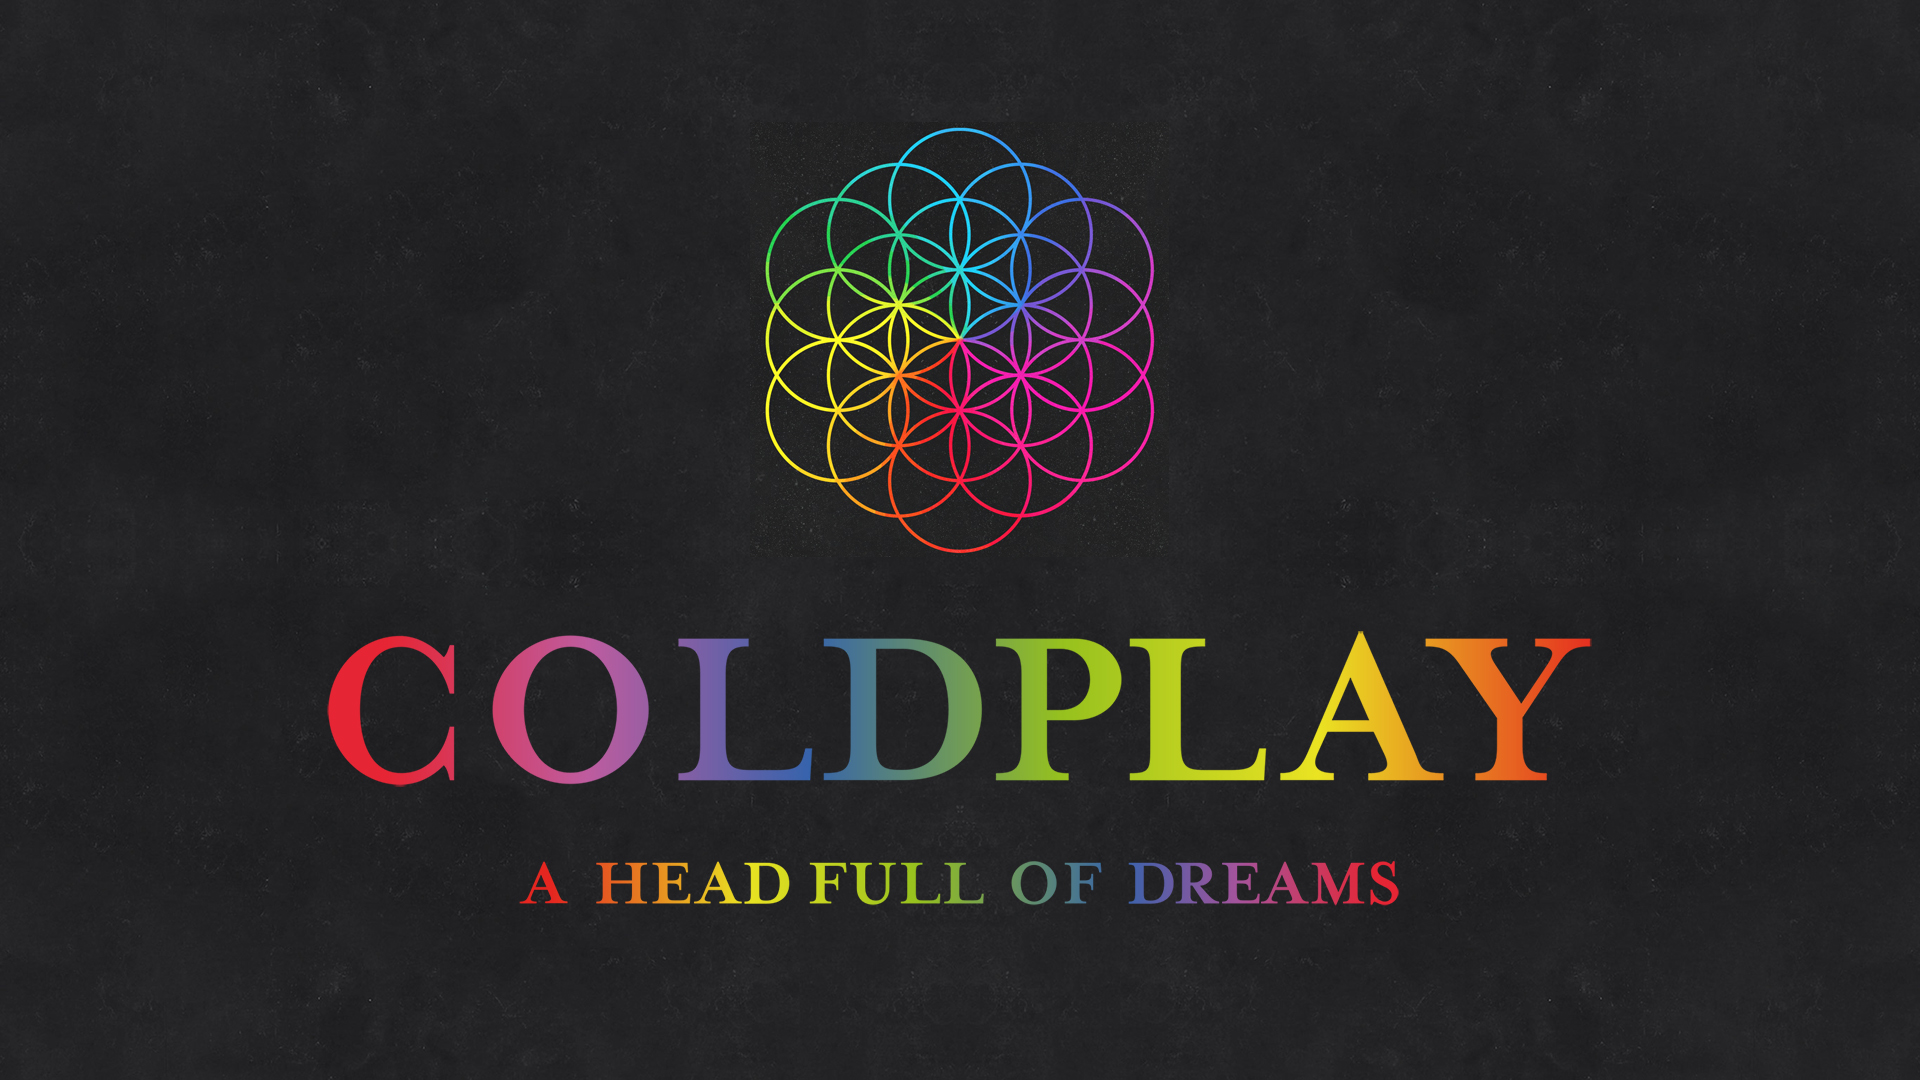 Coldplay 4 dicembre esce A head full of dreams date concerti e sorpresa per i fan